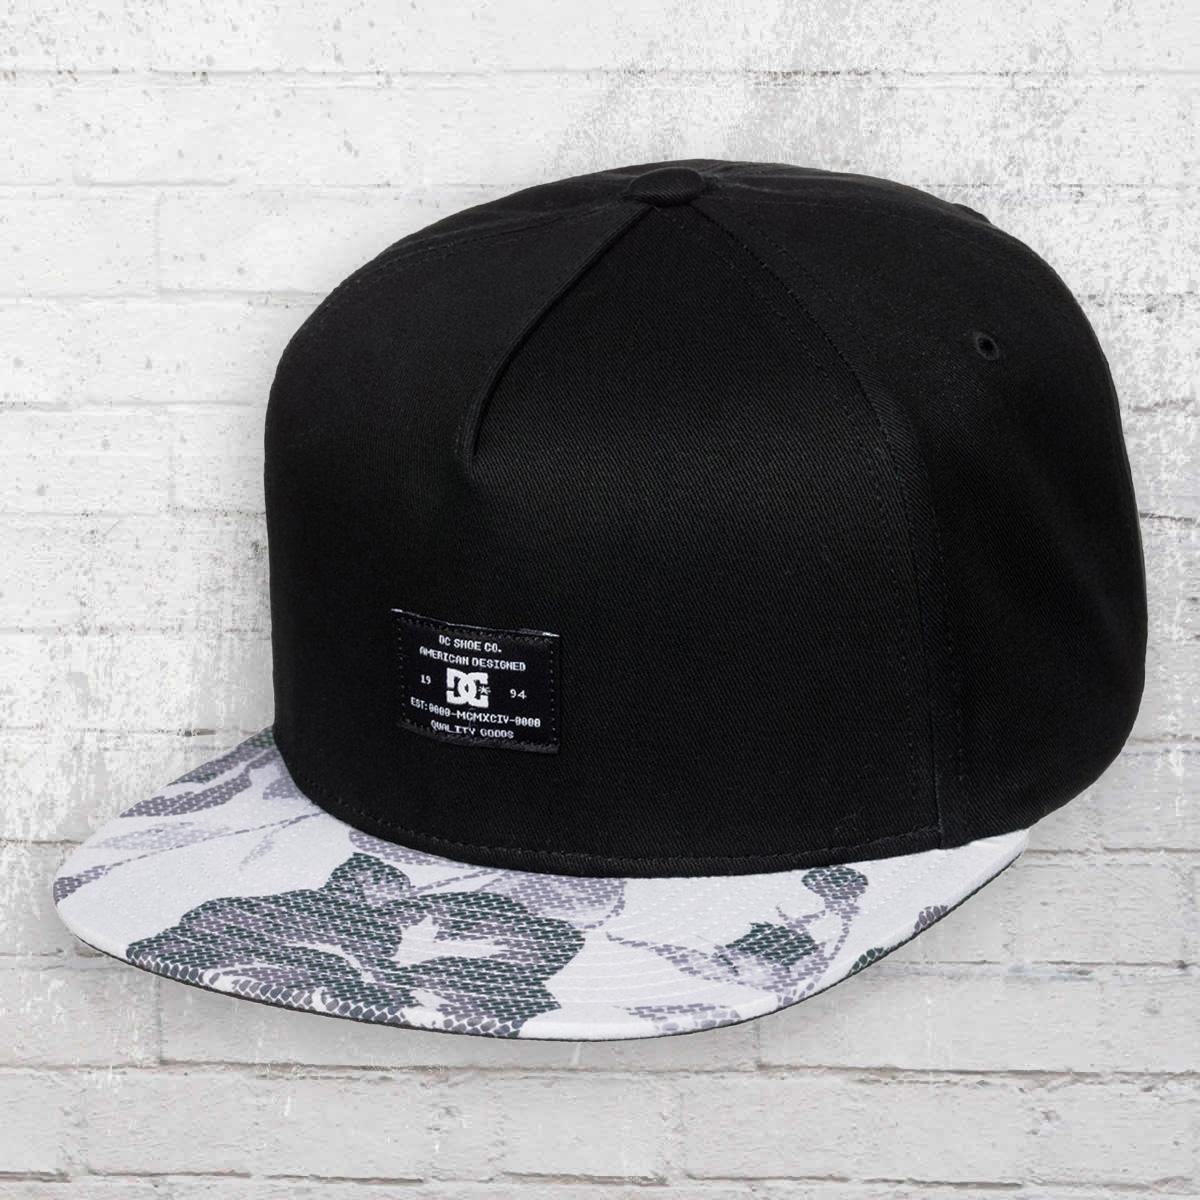 eb8a62c8545 Reynotts Snapback Cap For Men Adyha03733. Mens Hats Caps Plete Collection Dc  Shoes